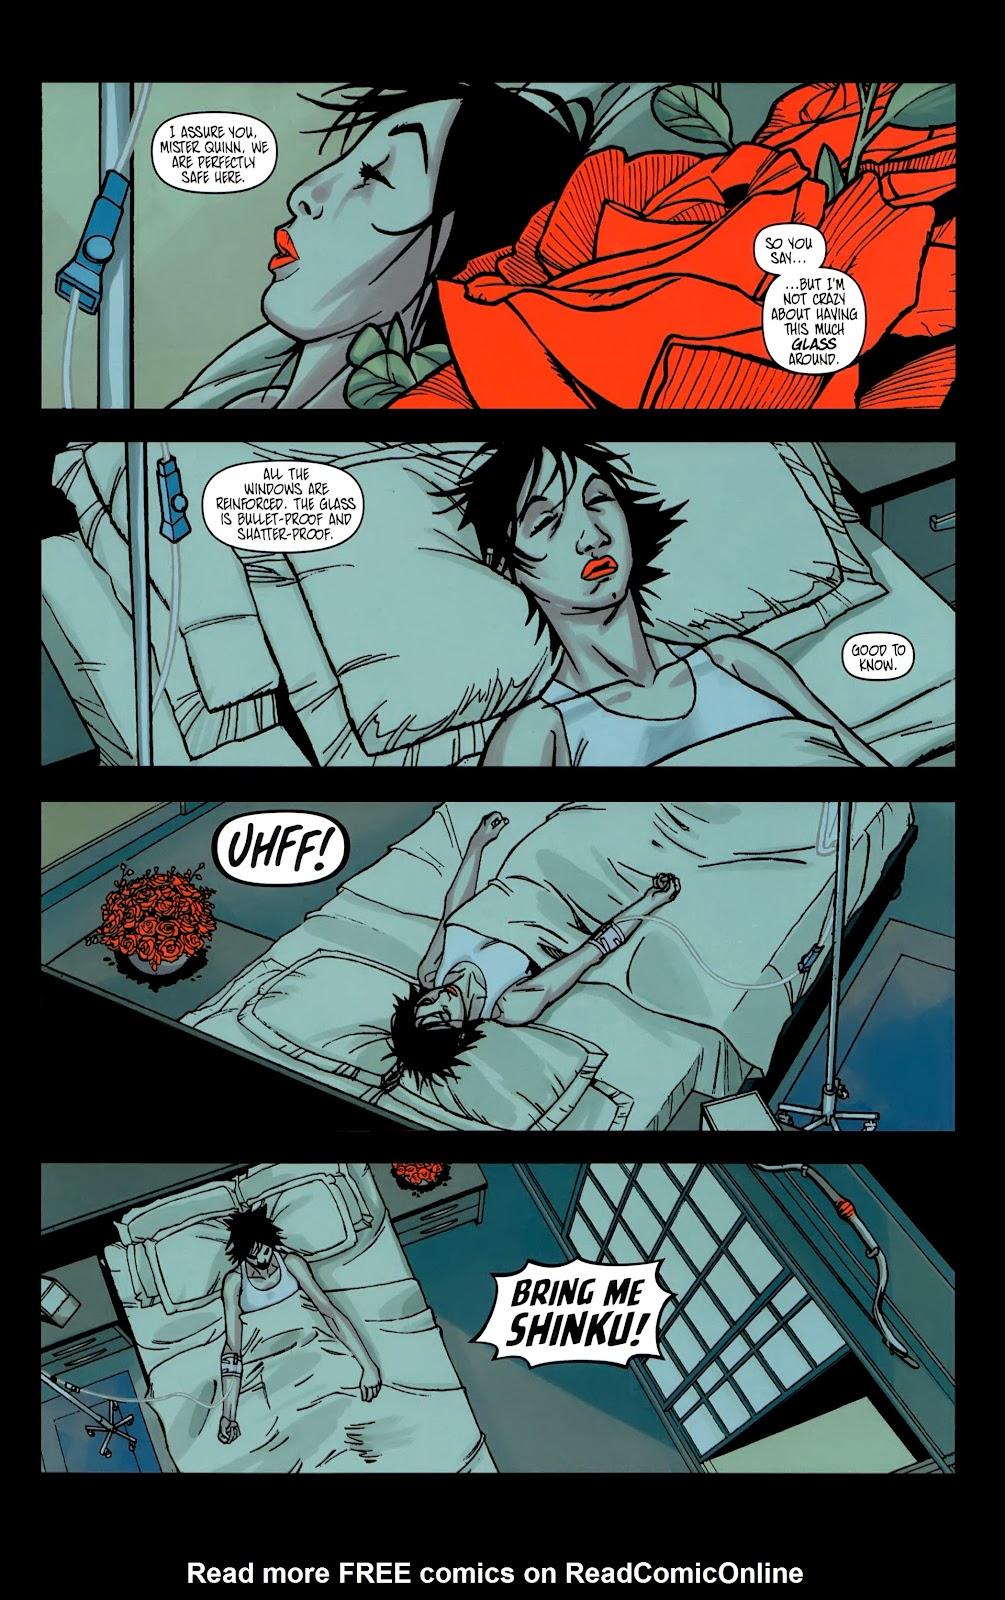 Read online Shinku comic -  Issue #5 - 3